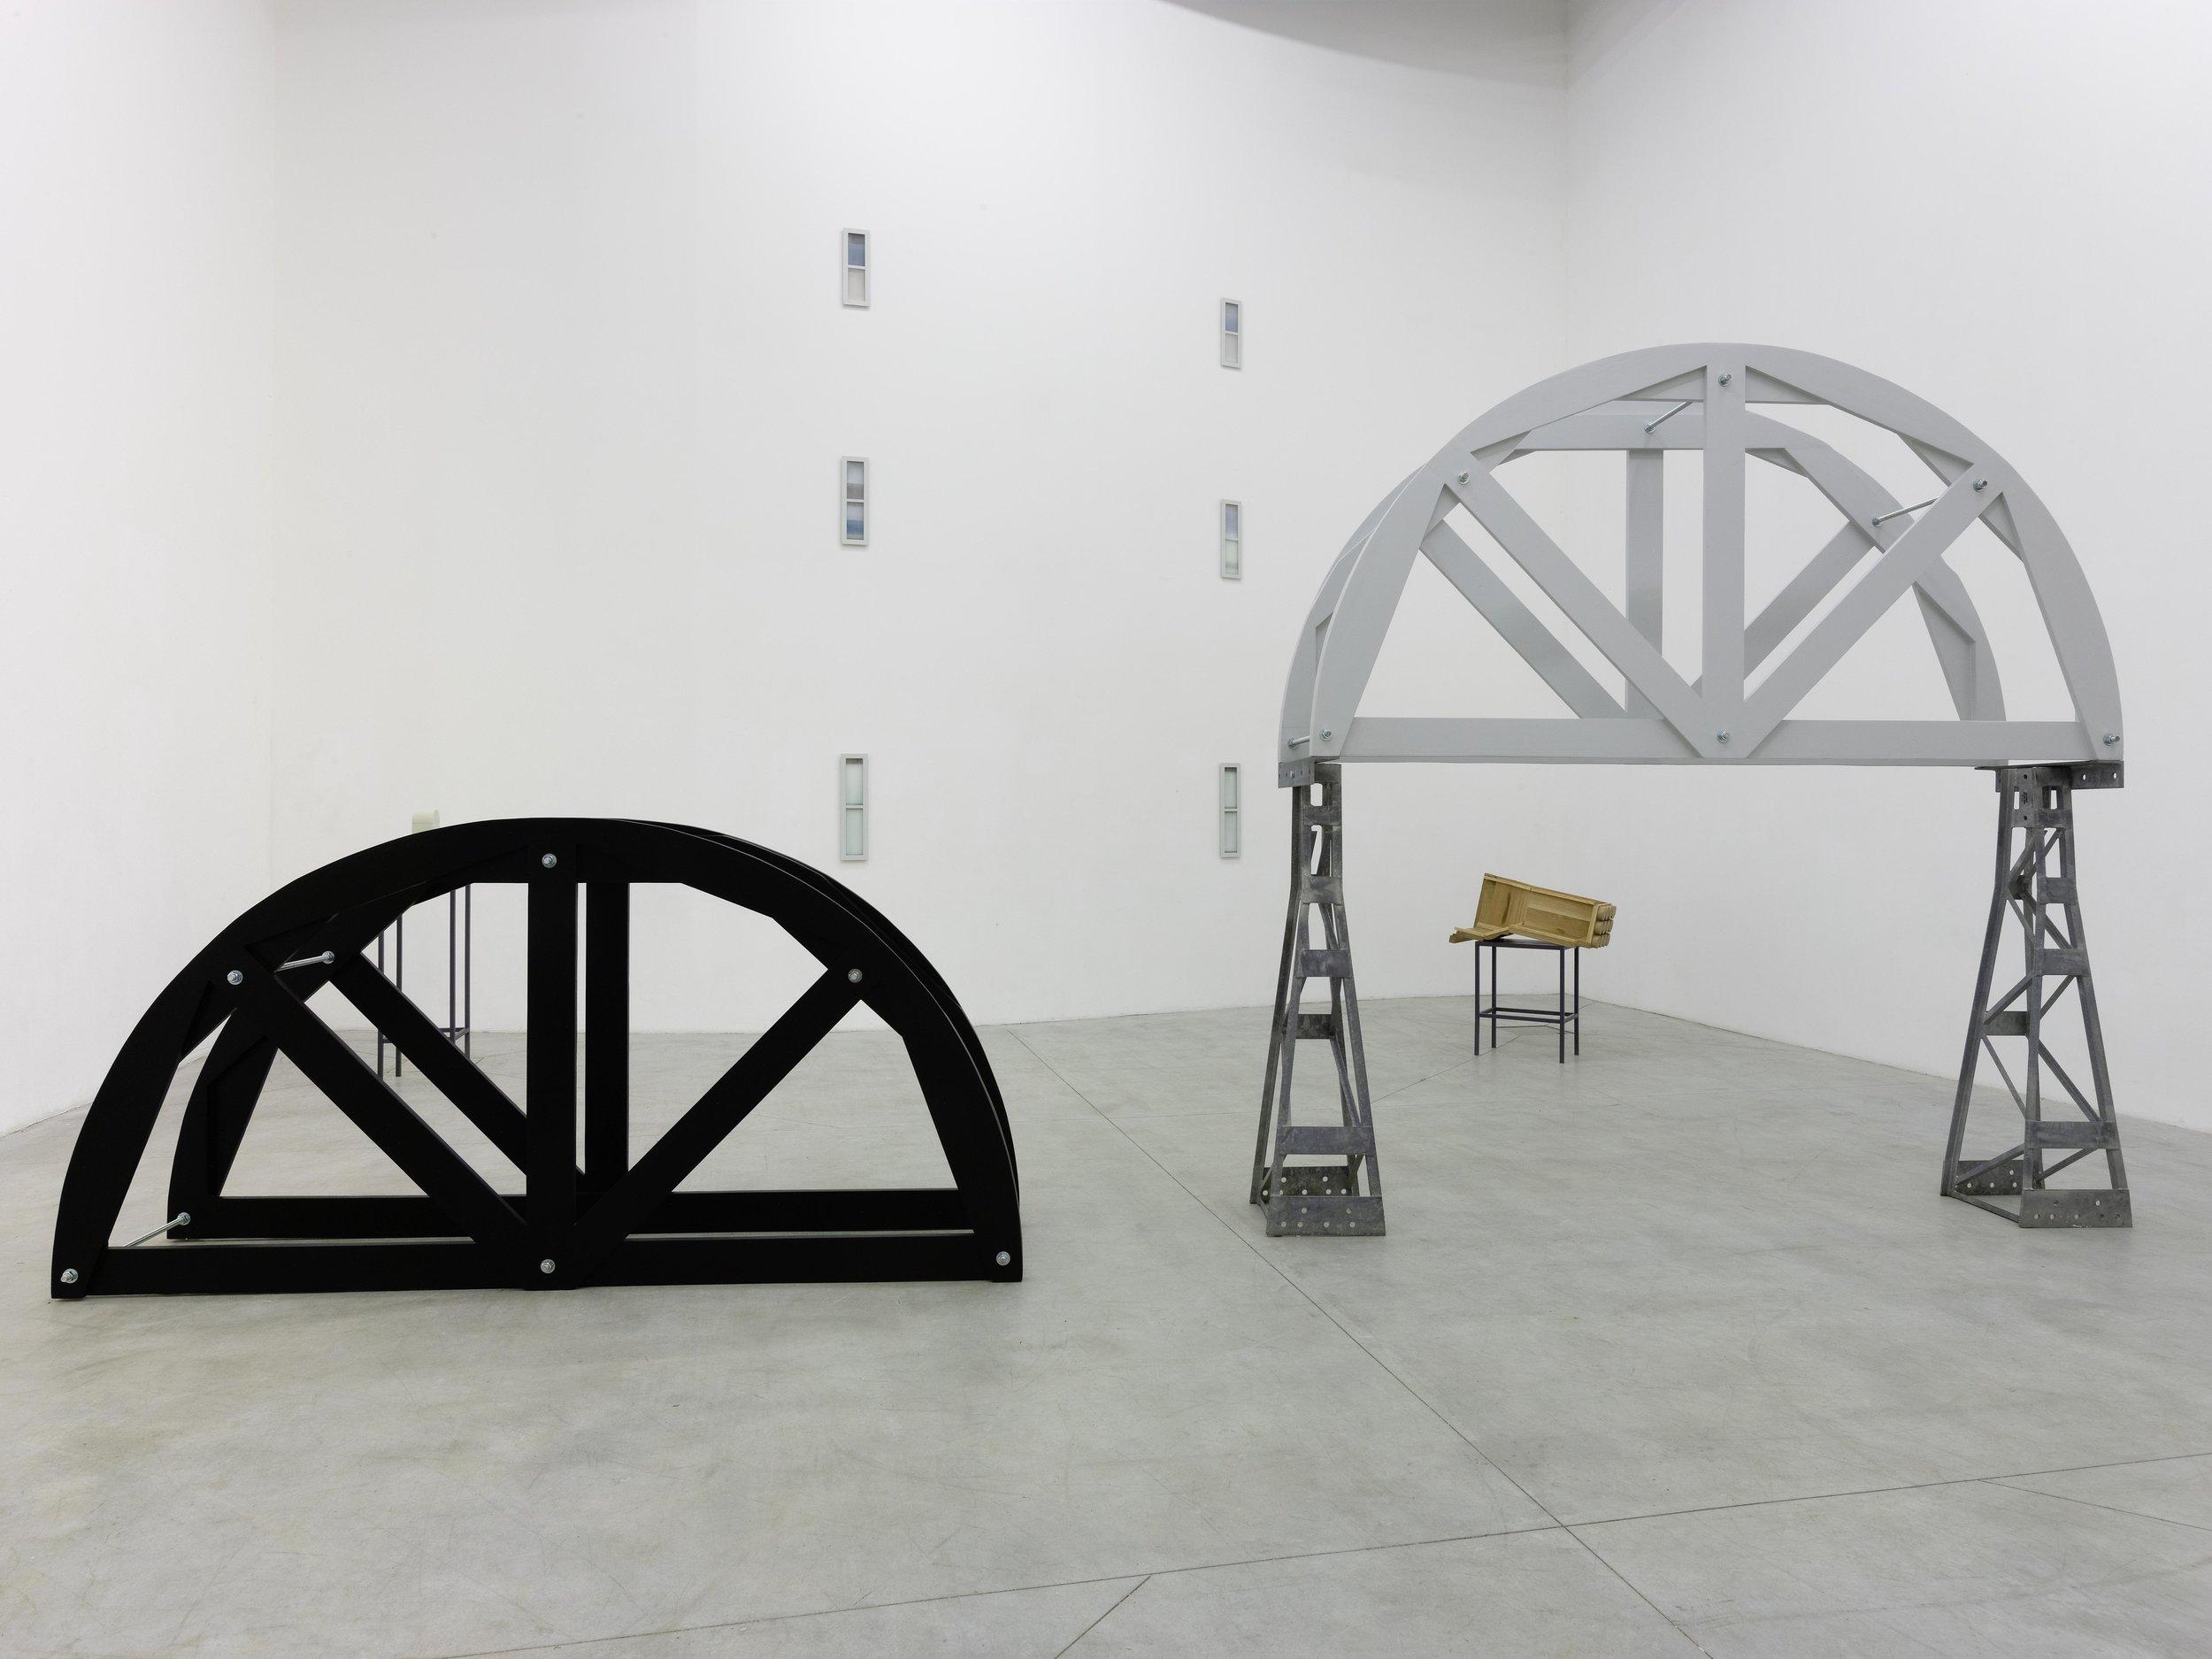 Valerie Snobeck, ' Build of a Nearby Valley while Looking Afar ', Le Consortium, Dijon, 2018, exhibition view  photo ©André Morin/Consortium Dijon